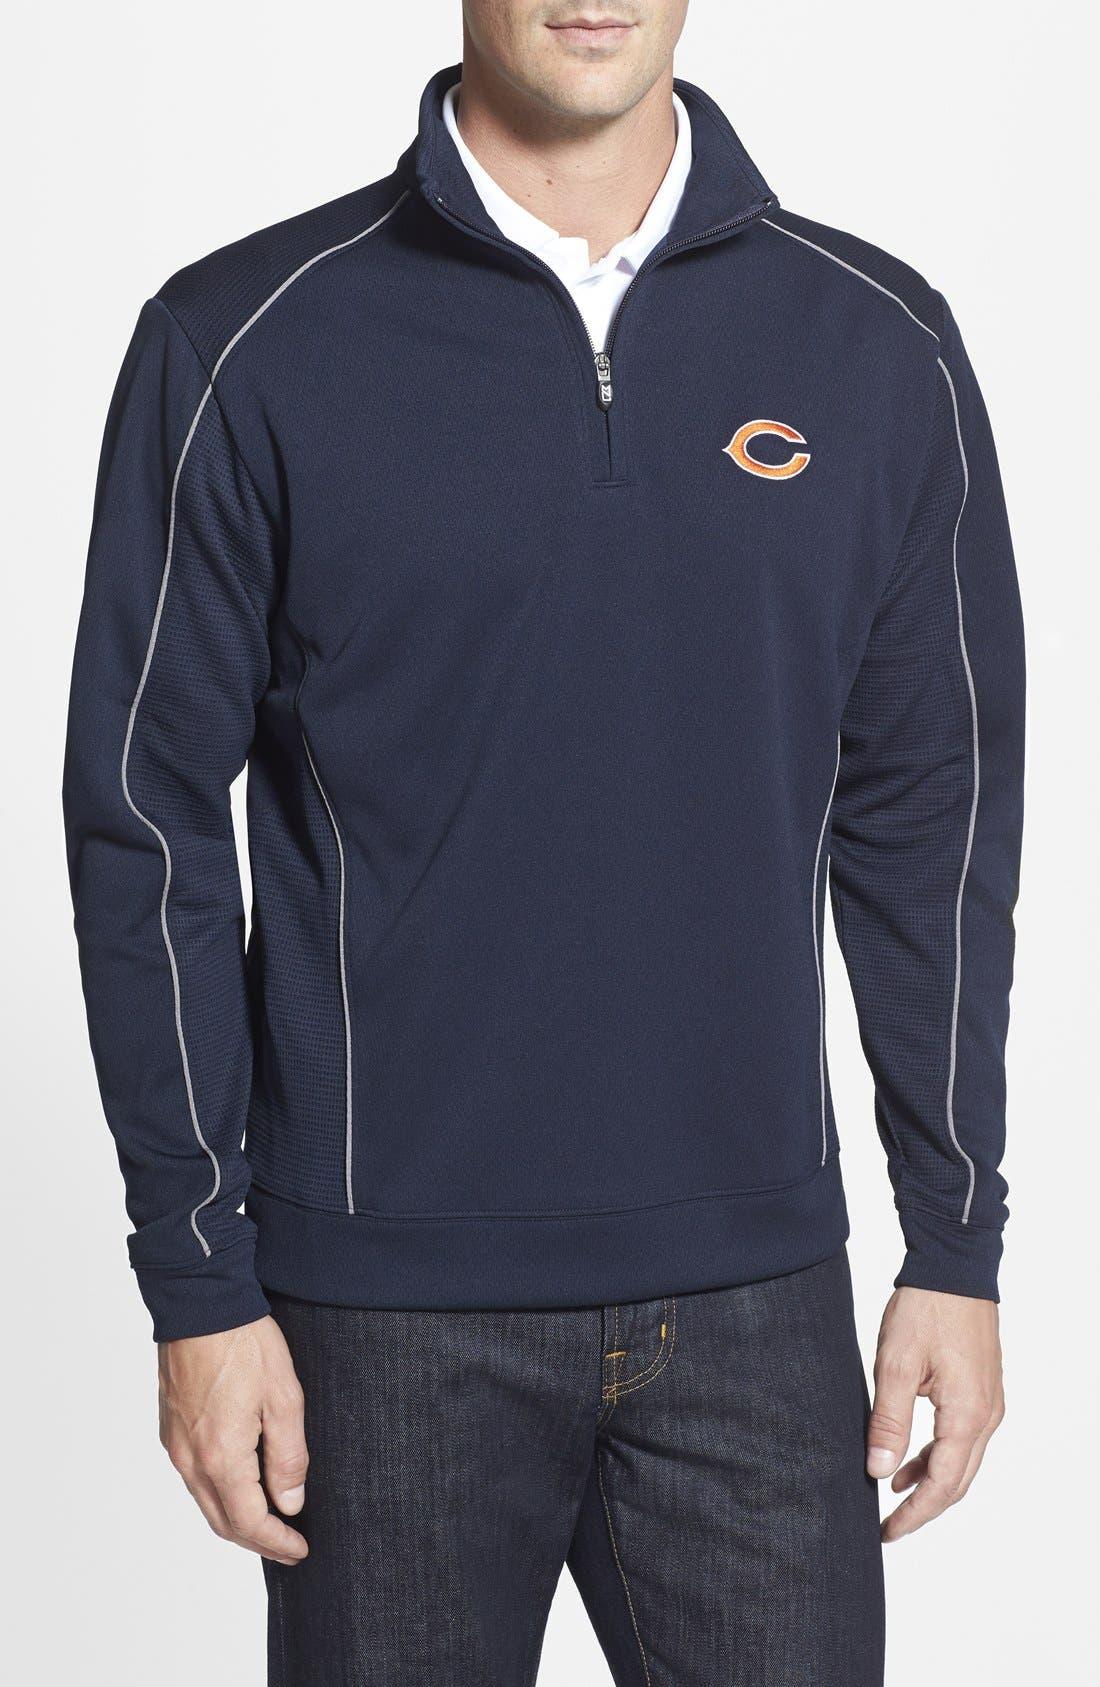 CUTTER & BUCK 'Chicago Bears - Edge' DryTec